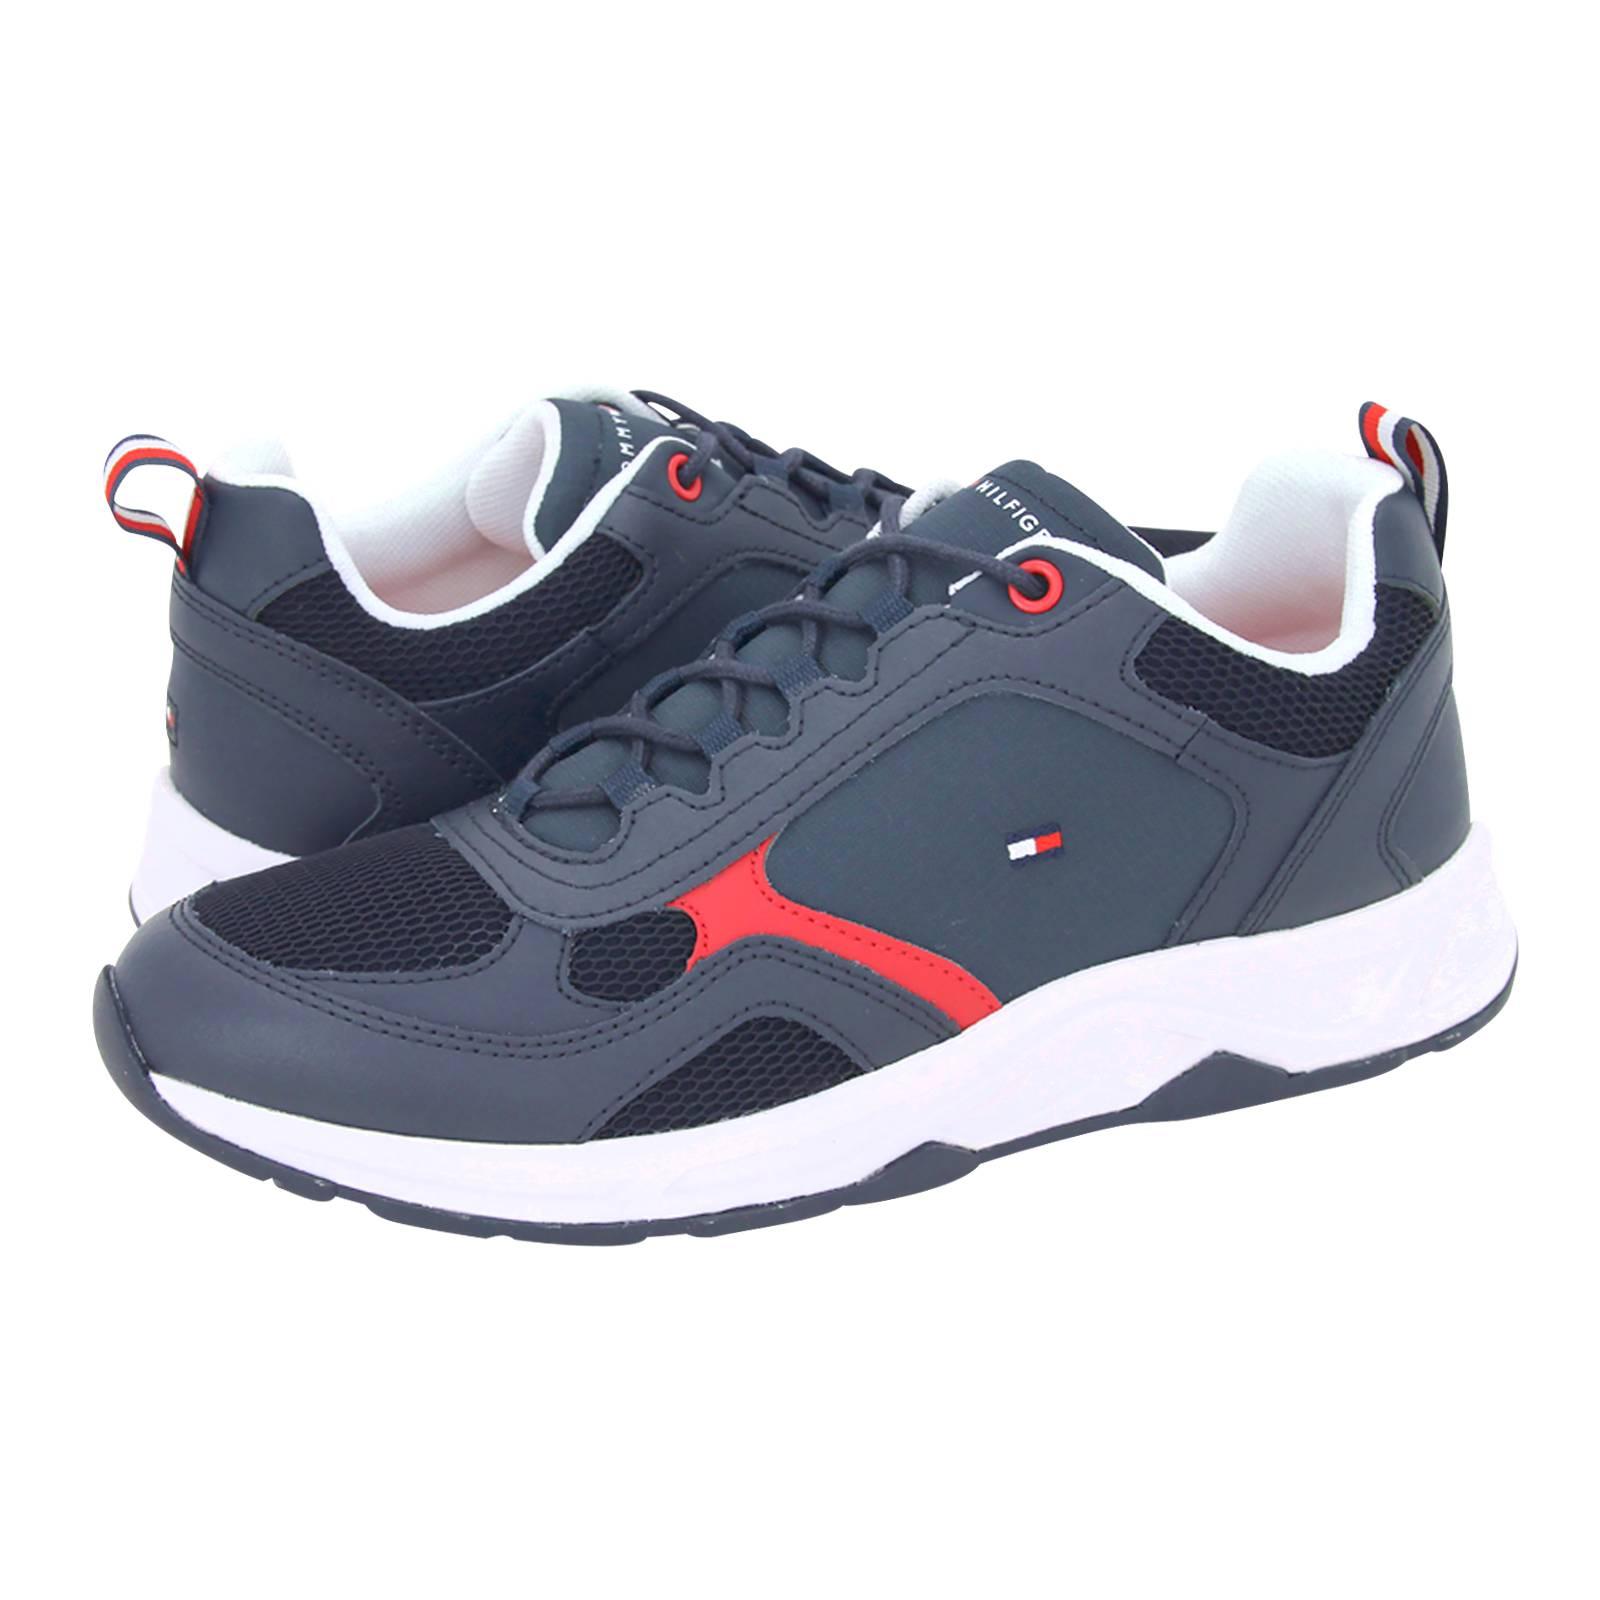 Fashion Mix Sneaker - Tommy Hilfiger